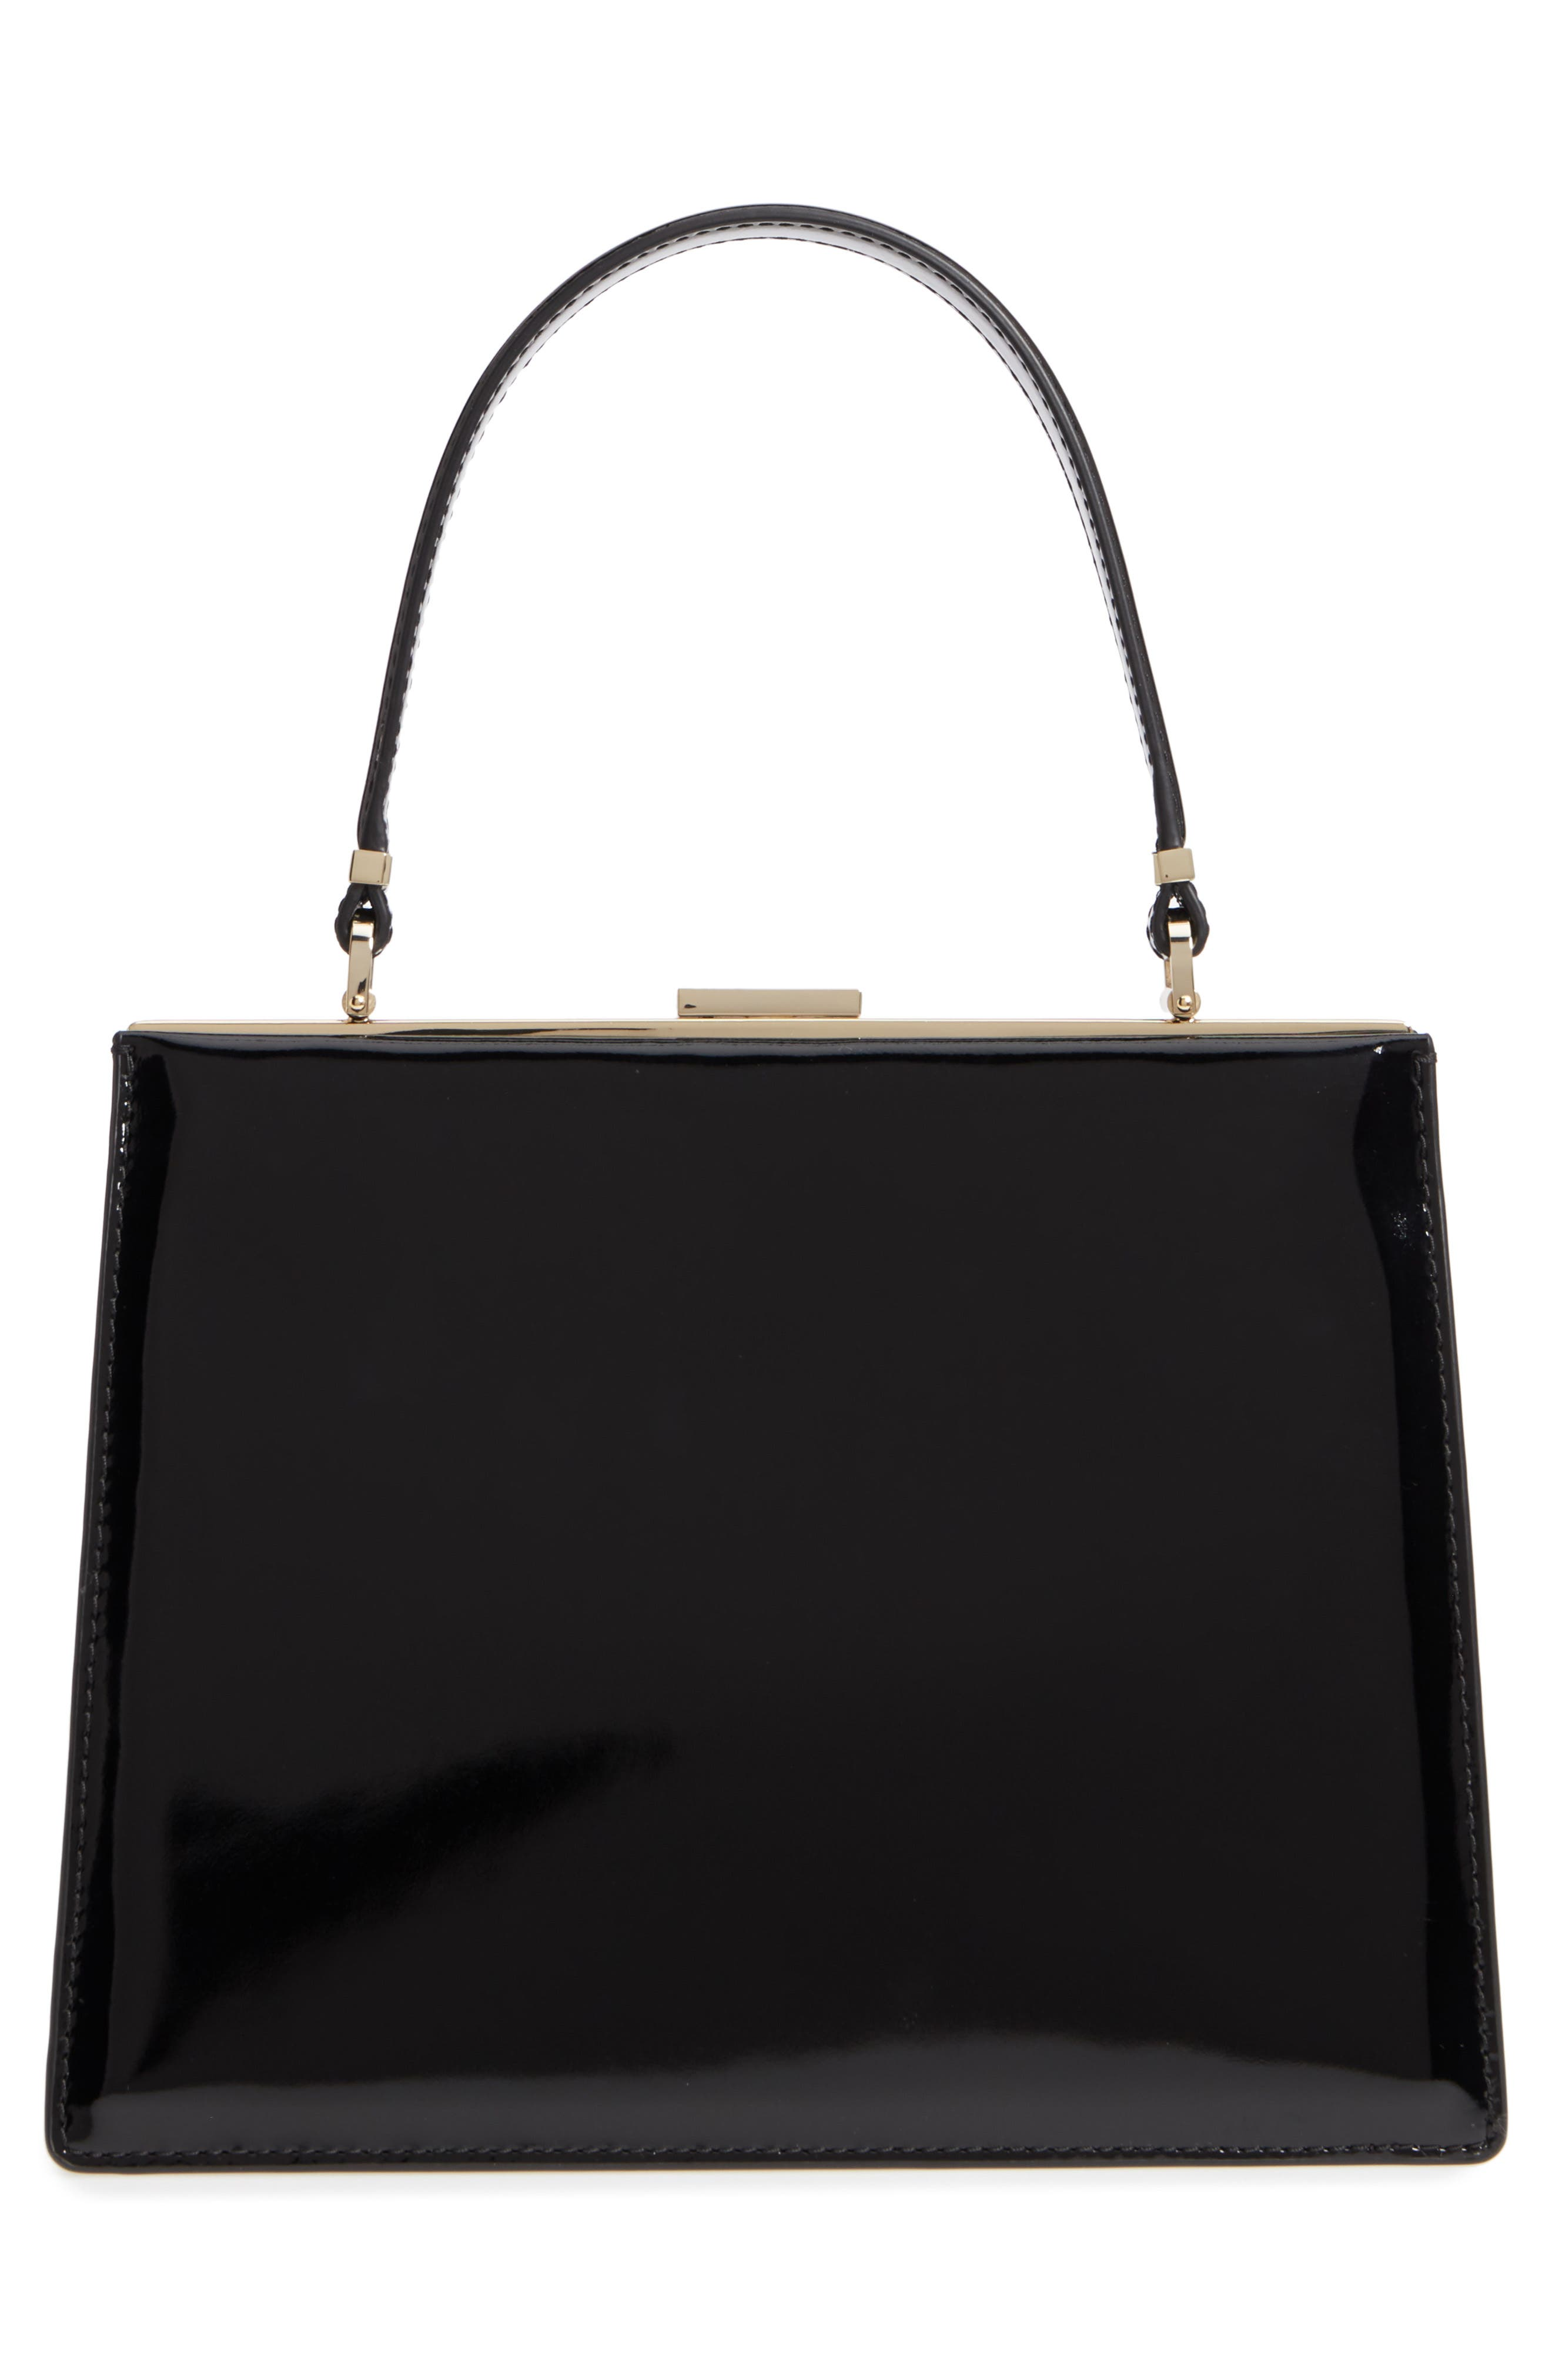 madison moore road - chari leather handbag,                             Alternate thumbnail 3, color,                             001